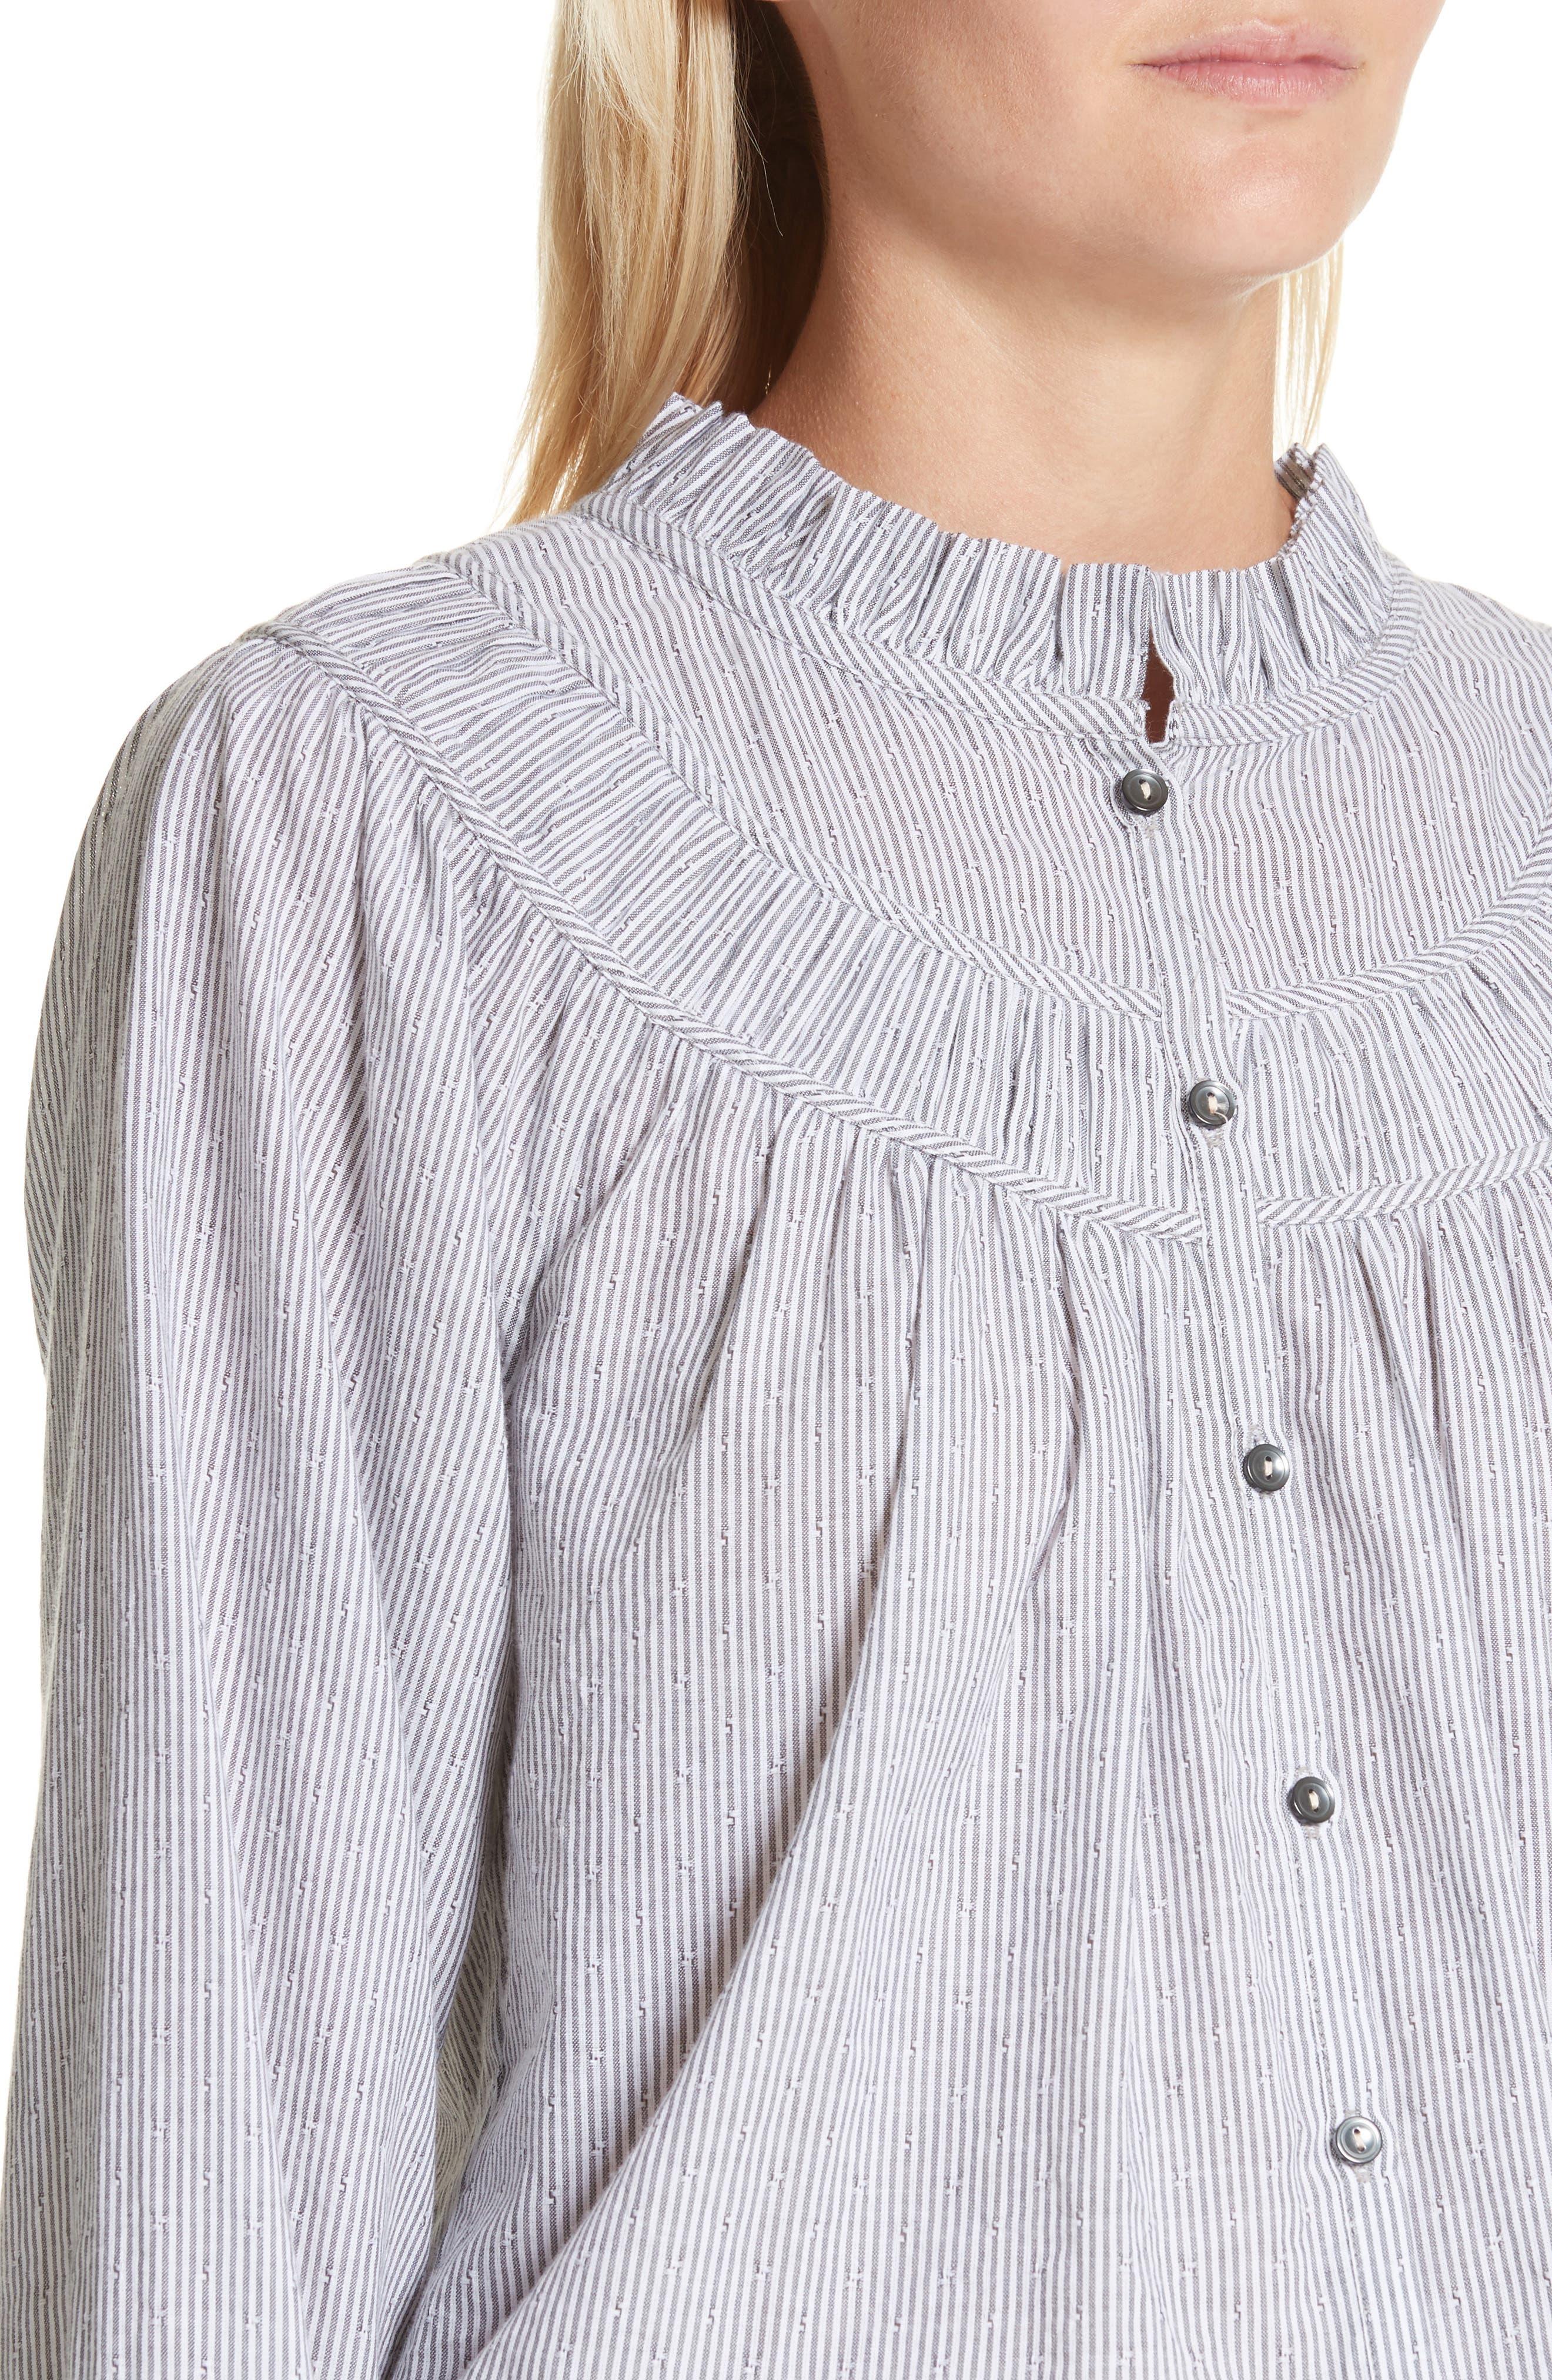 Stripe Long Sleeve Ruffle Shirt,                             Alternate thumbnail 4, color,                             Washed Black Combo